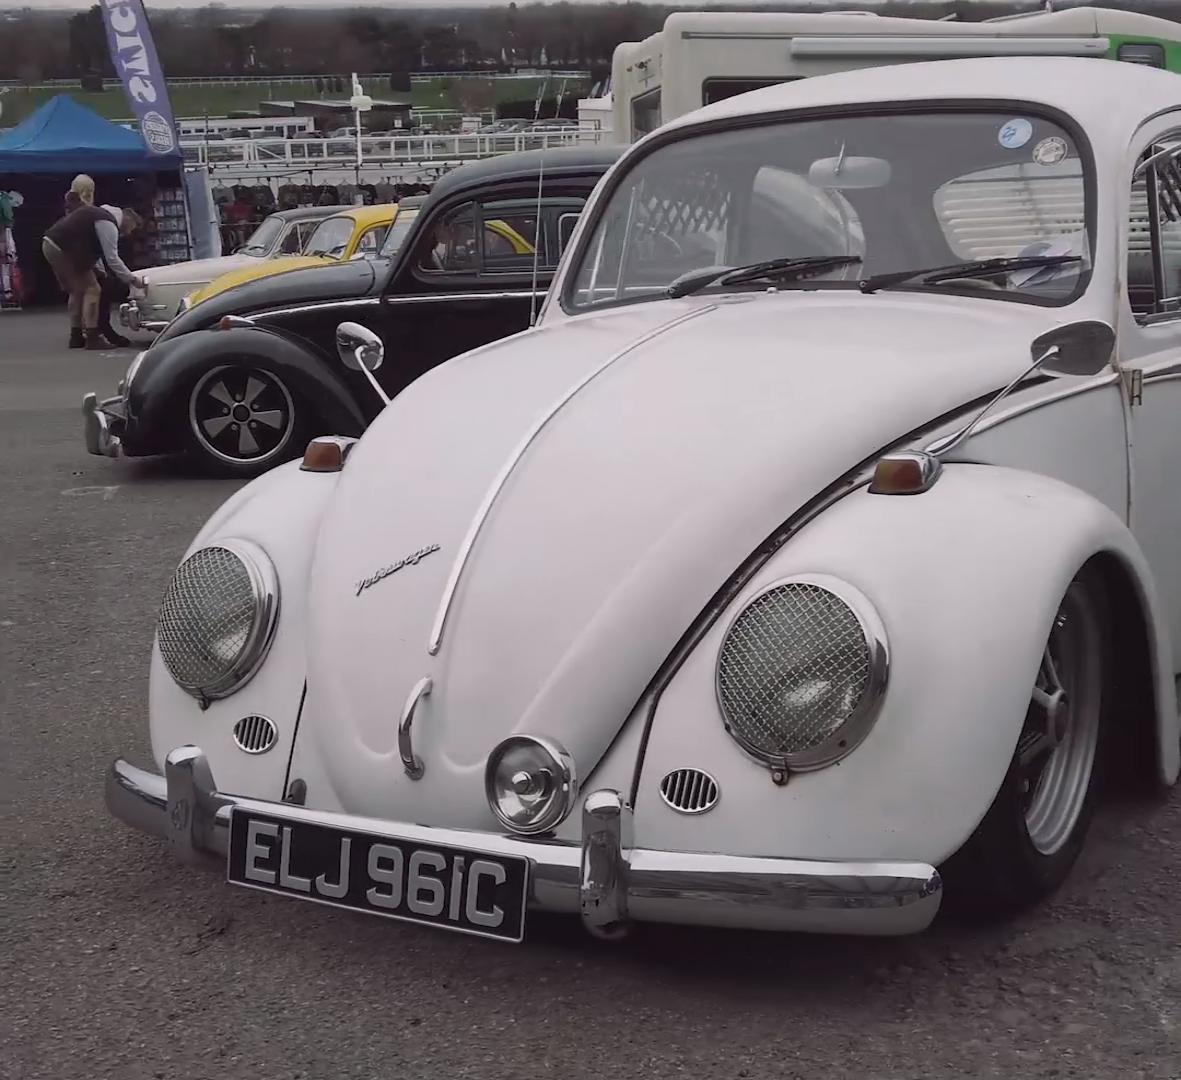 Joemungus Shop Redbubble Video Video In 2020 Classic Volkswagen Vw Cars Vw Splitscreen